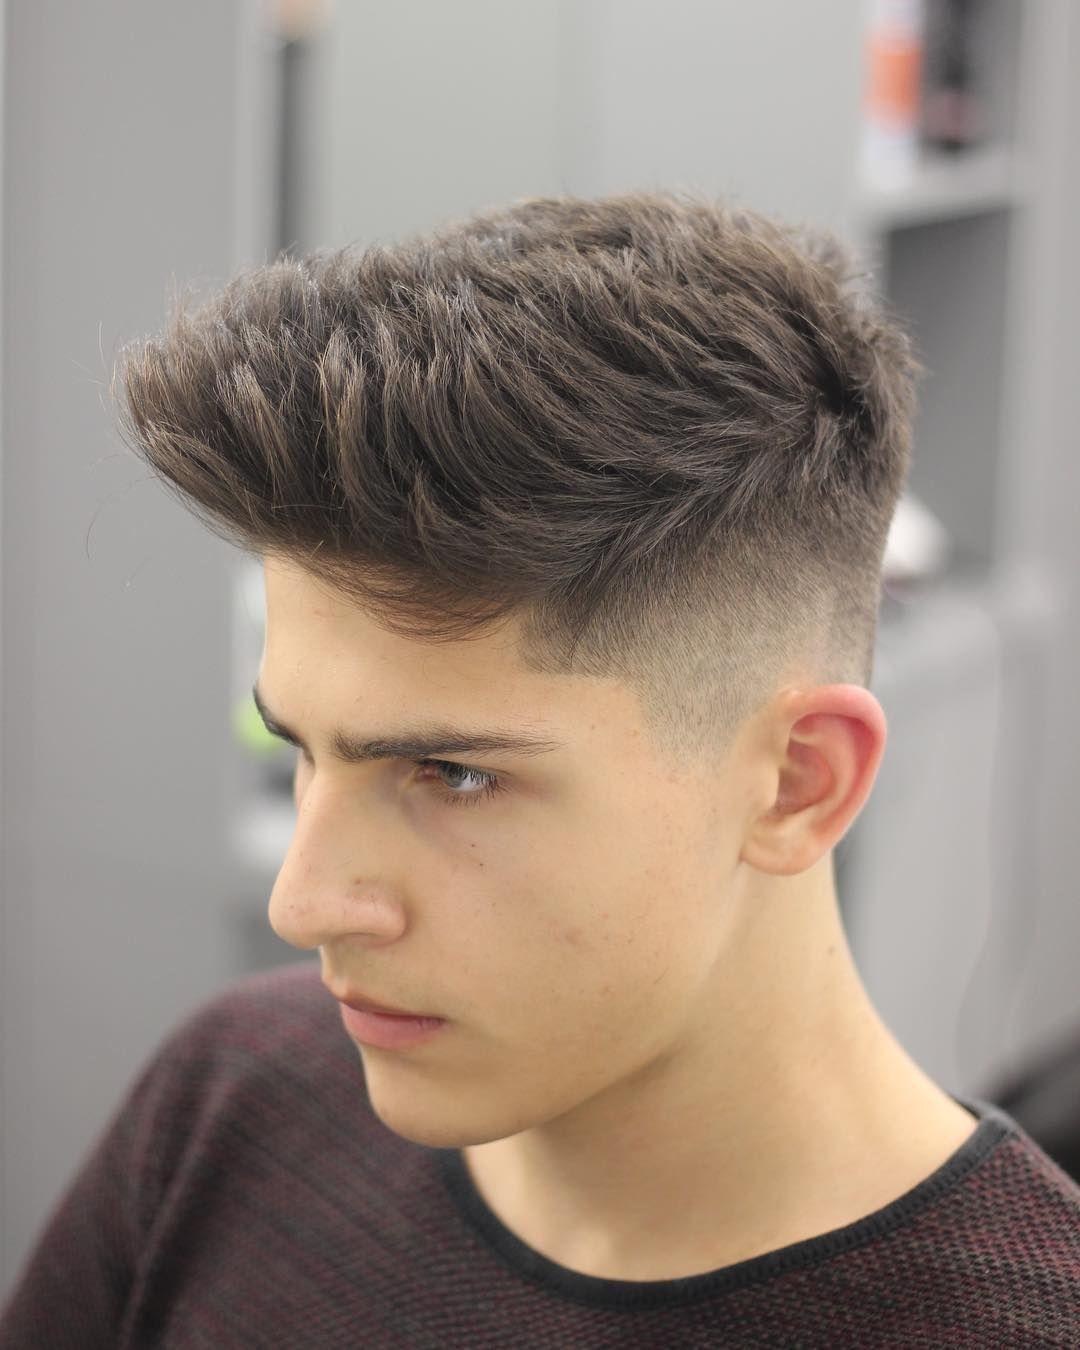 Mens haircut tutorials emilio hernandez hemilio on pinterest